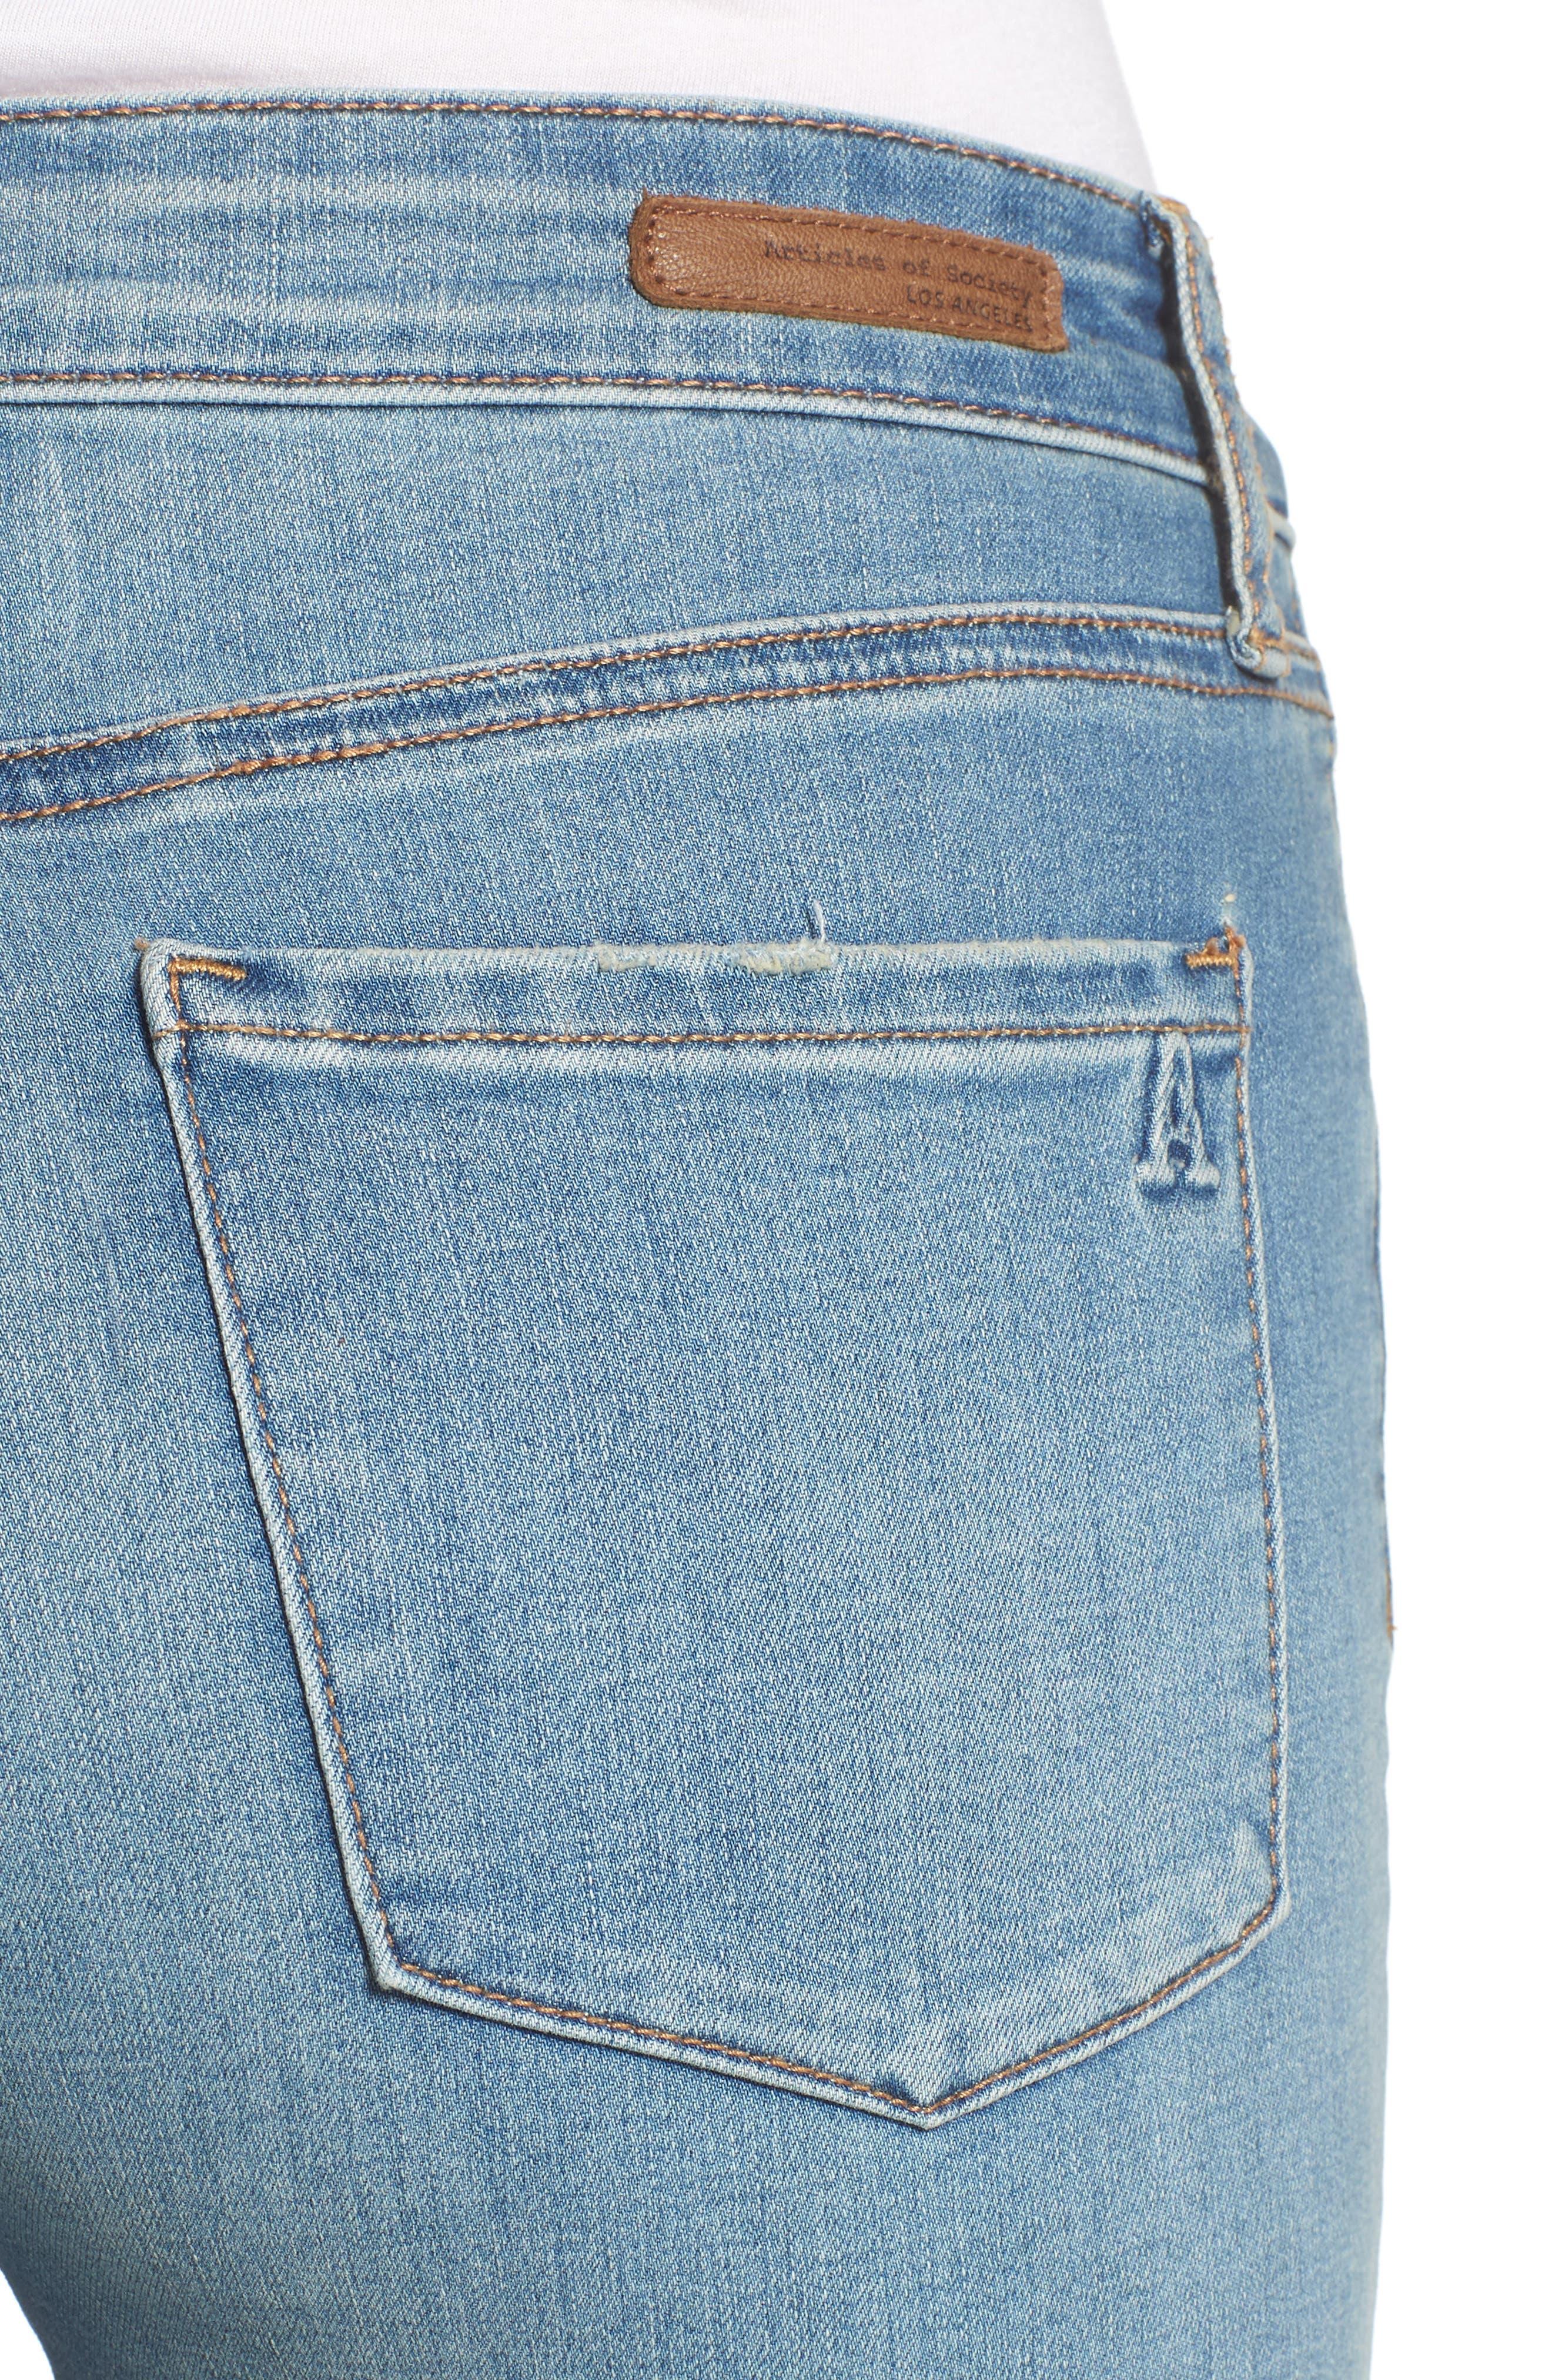 Heather High Waist Skinny Jeans,                             Alternate thumbnail 4, color,                             481